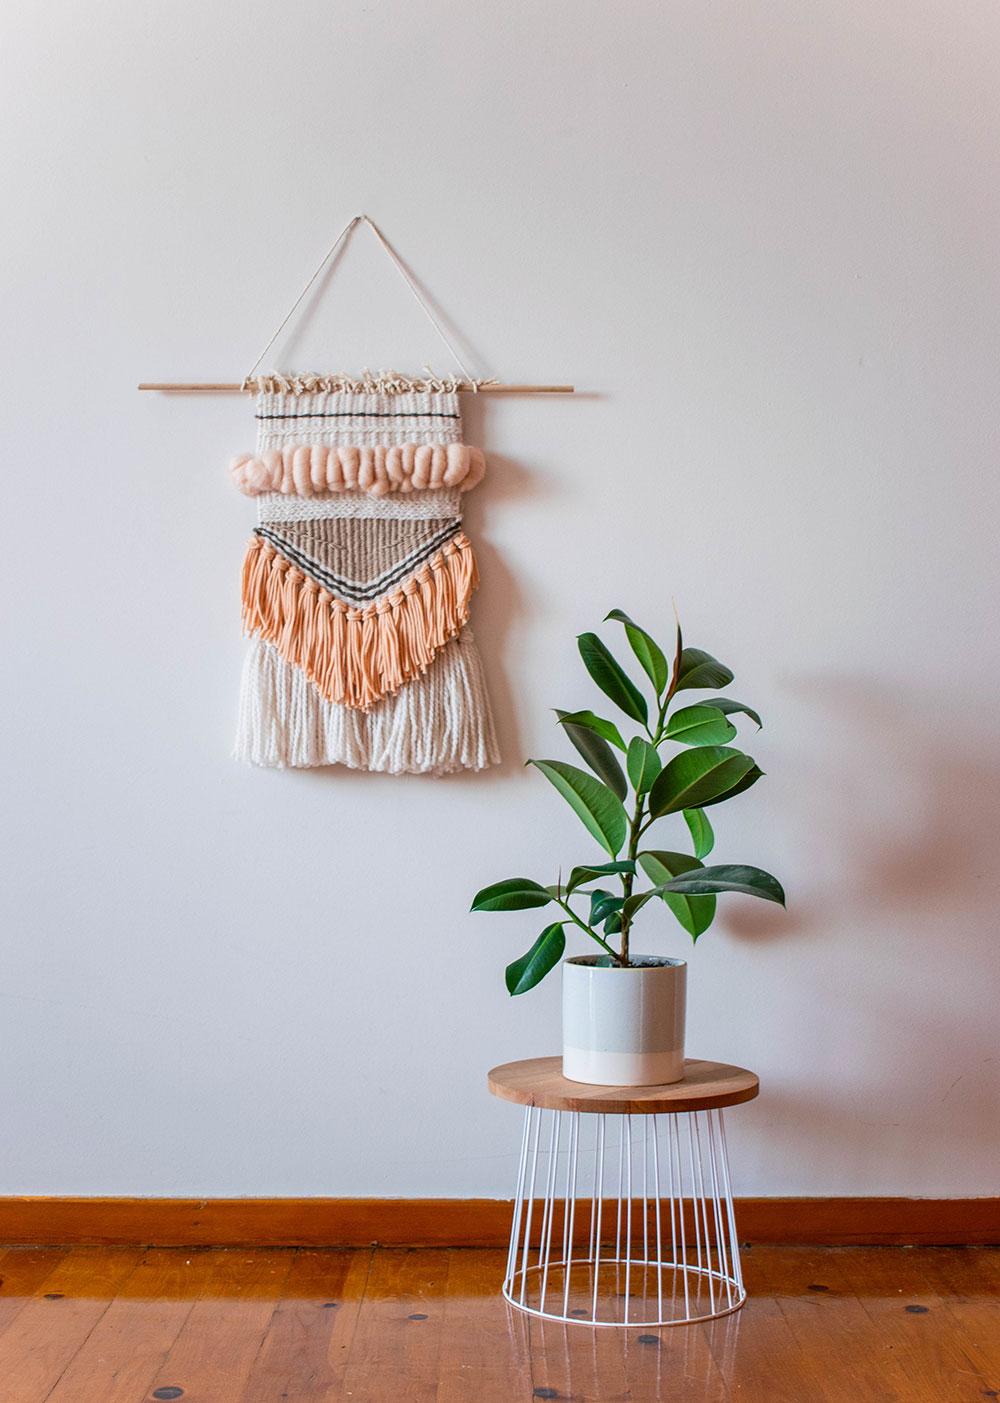 Ashinyday-φυτά-εσωτερικού-χώρου-φικος-1